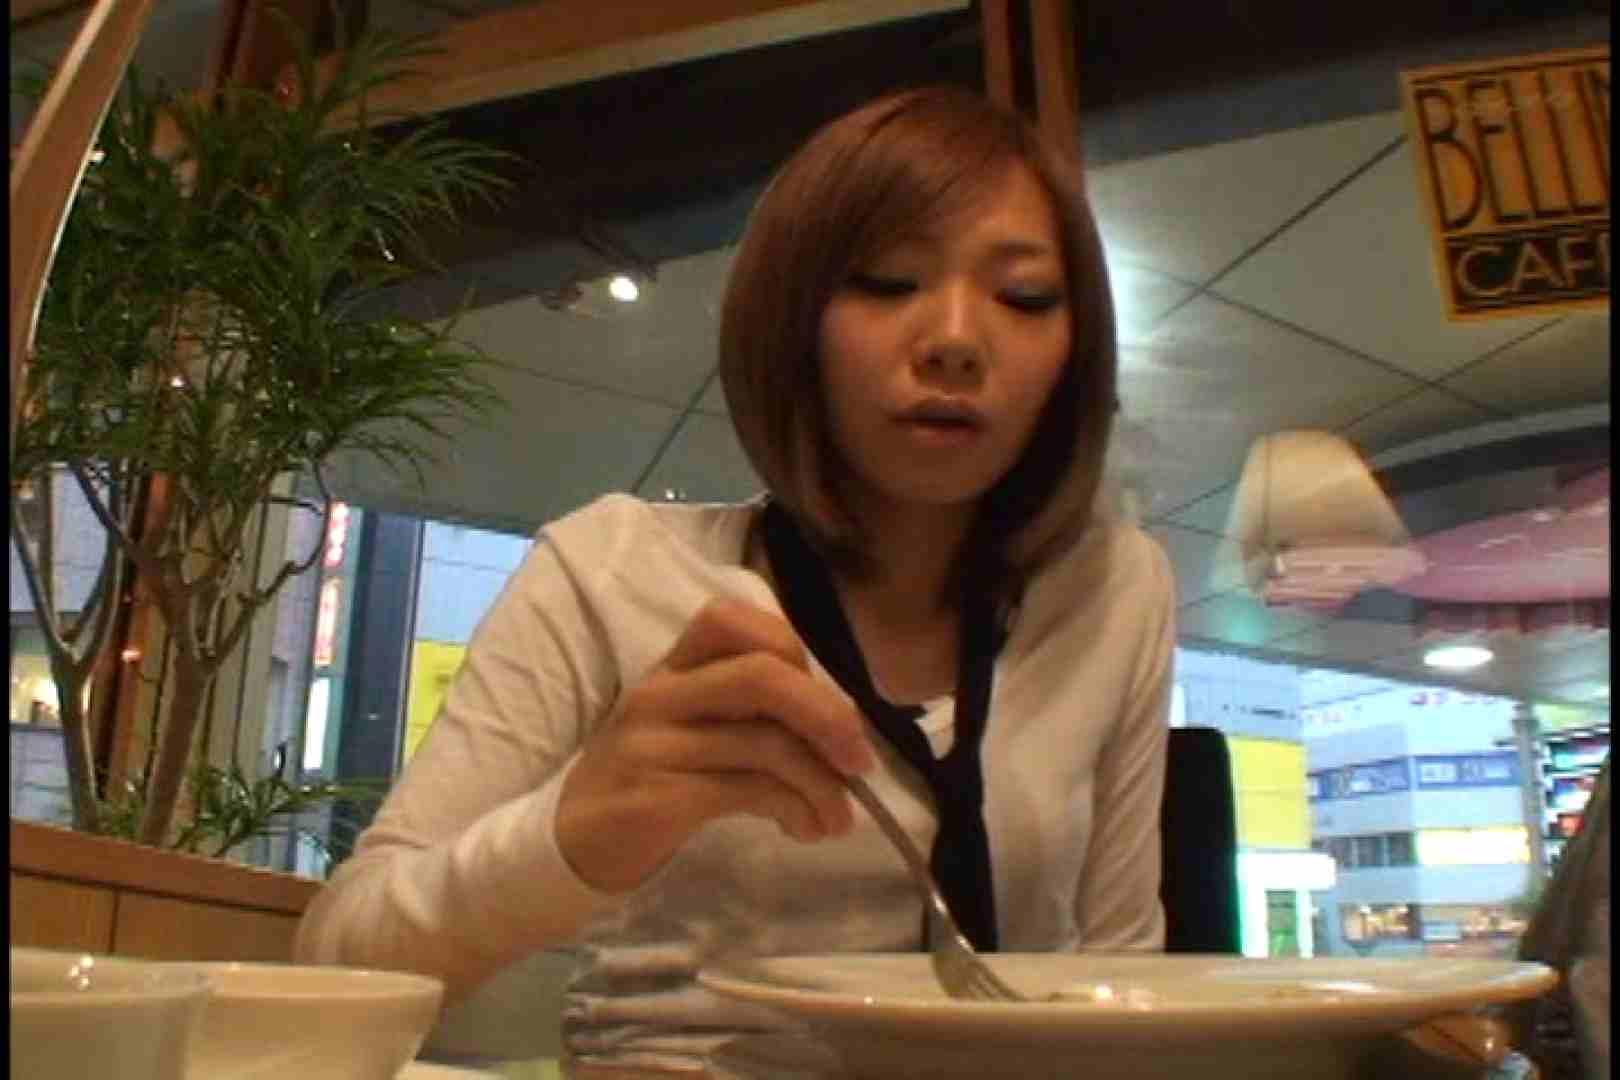 JDハンター全国ツアー vol.036 前編 女子大生のエロ動画  85PIX 32